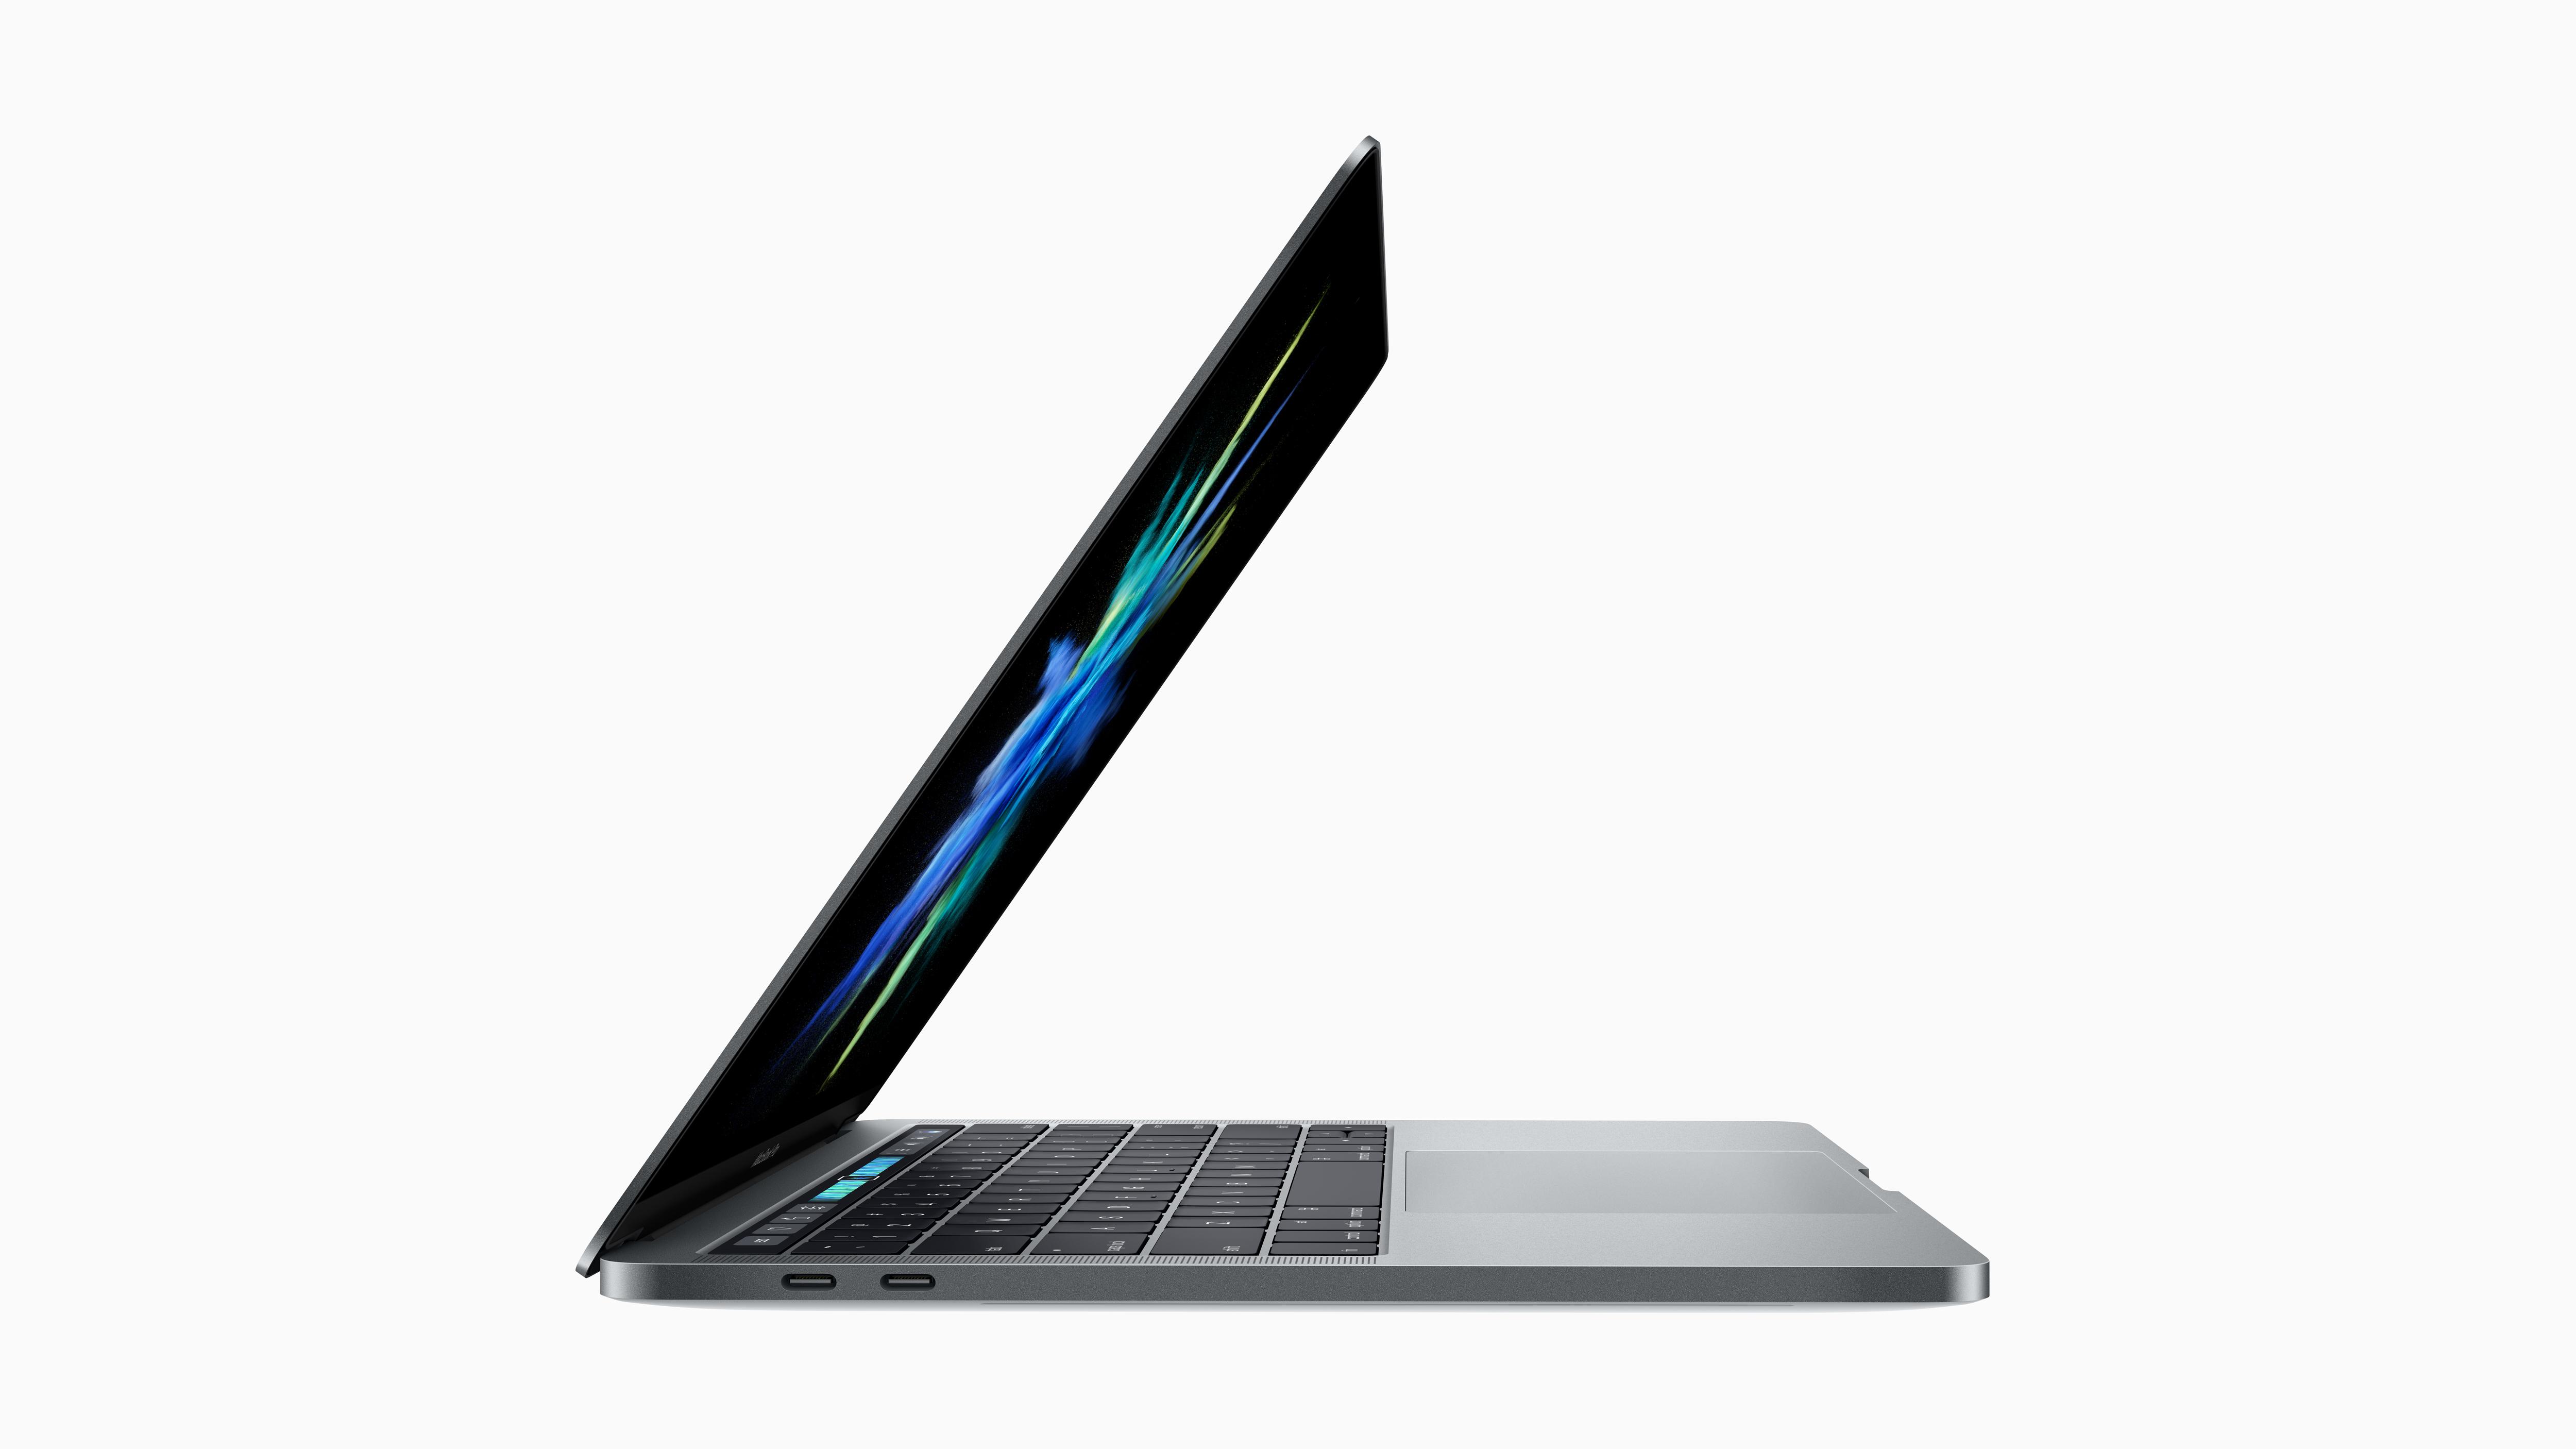 The new MacBook Pro.